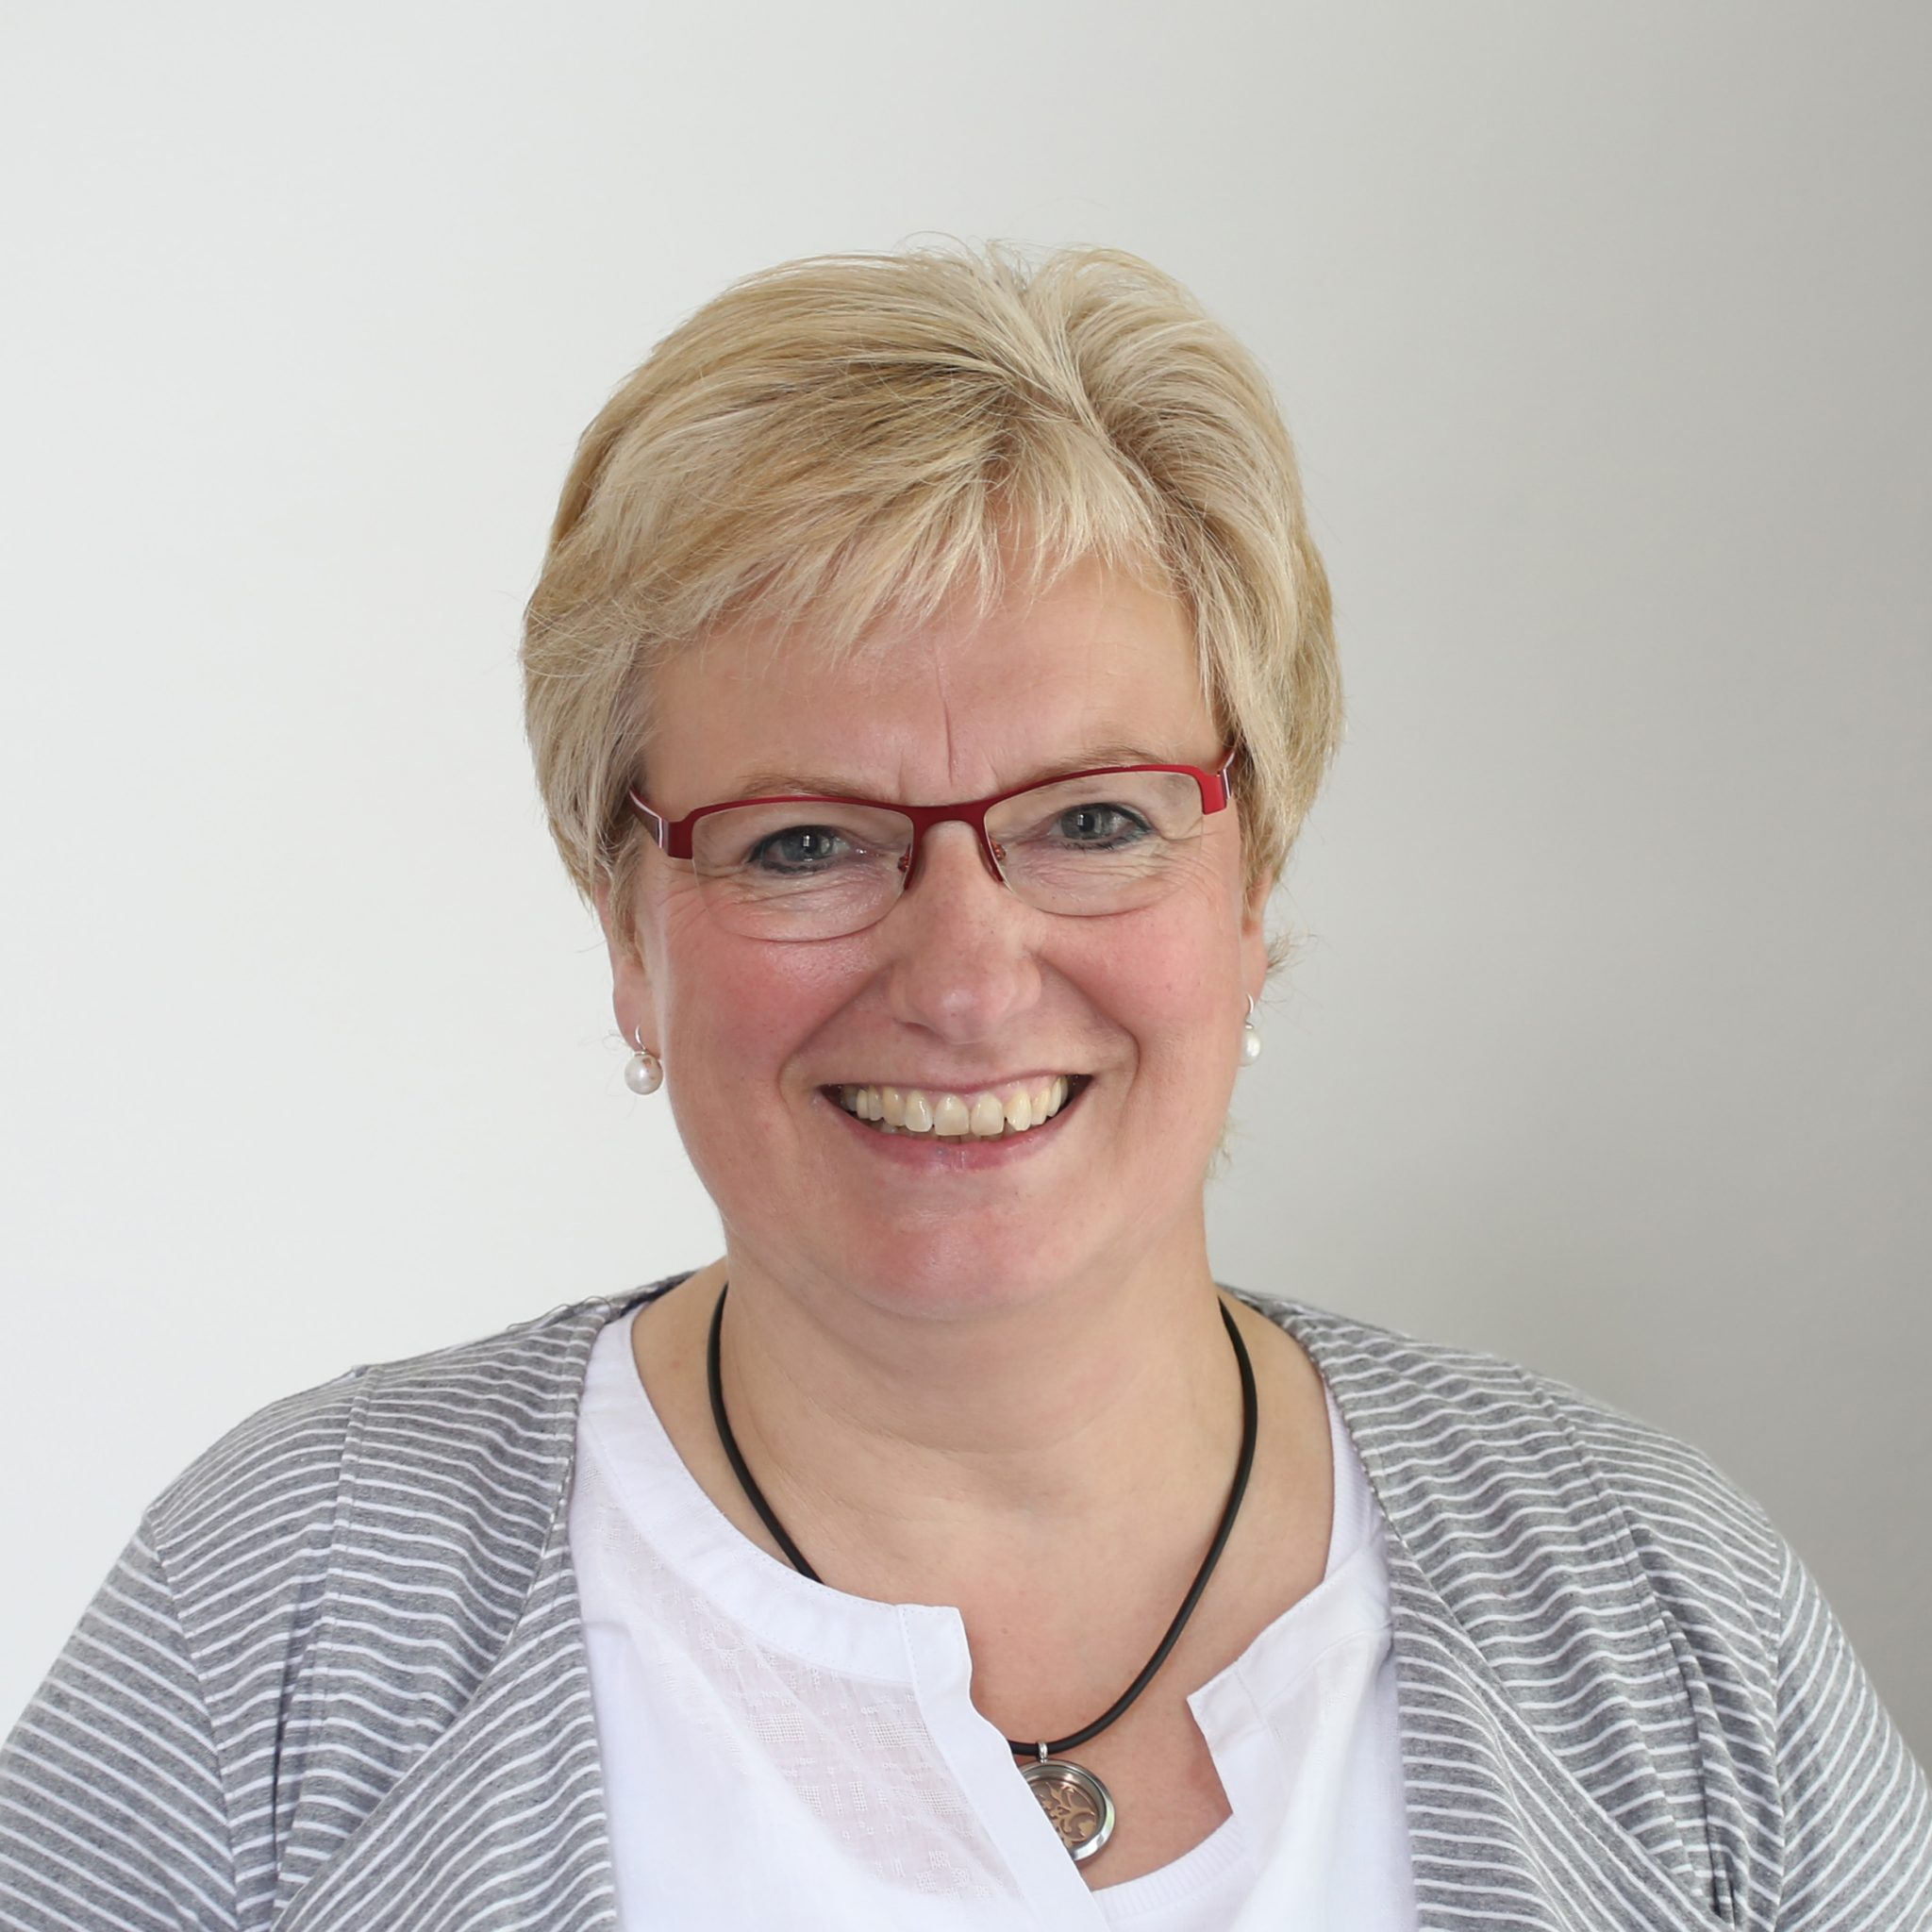 Christa Badenhorst